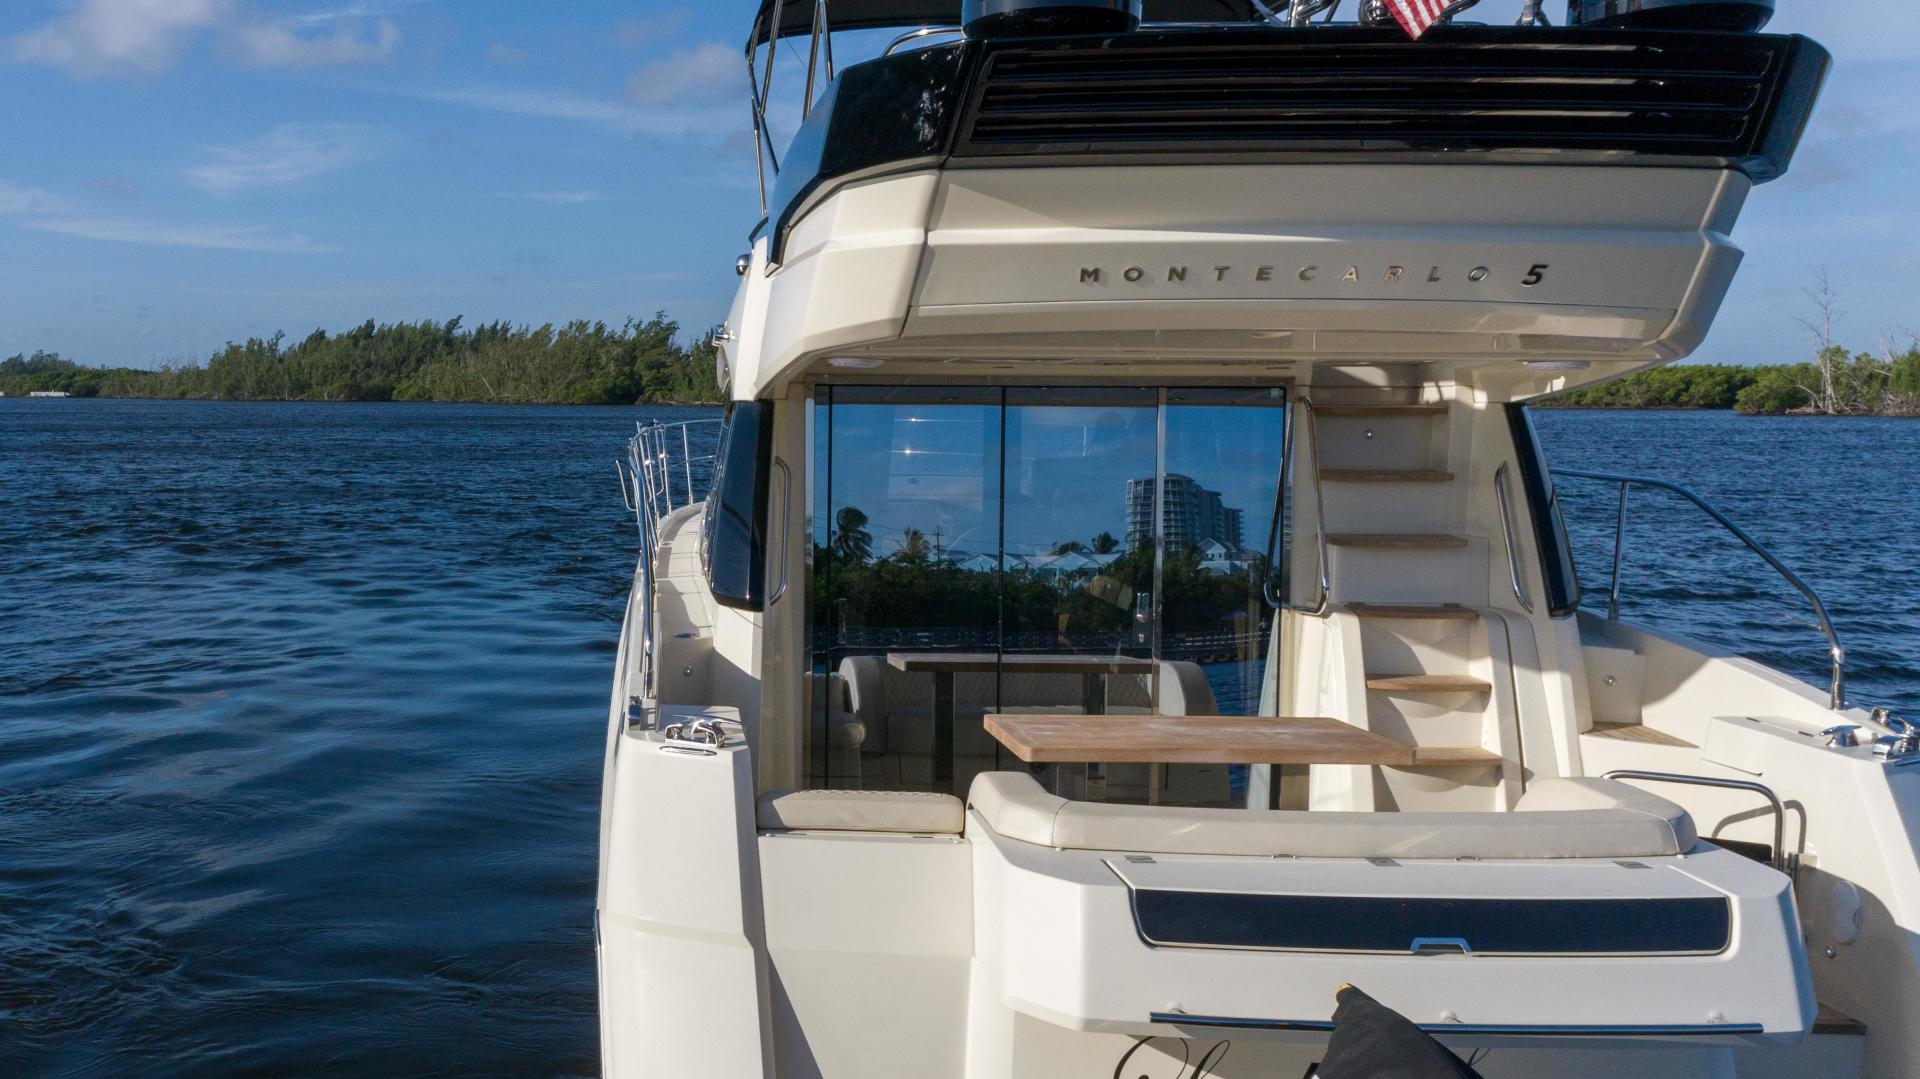 Monte Carlo-MC5 2016-Lady Susan Fort Lauderdale -Florida-United States-1510713 | Thumbnail